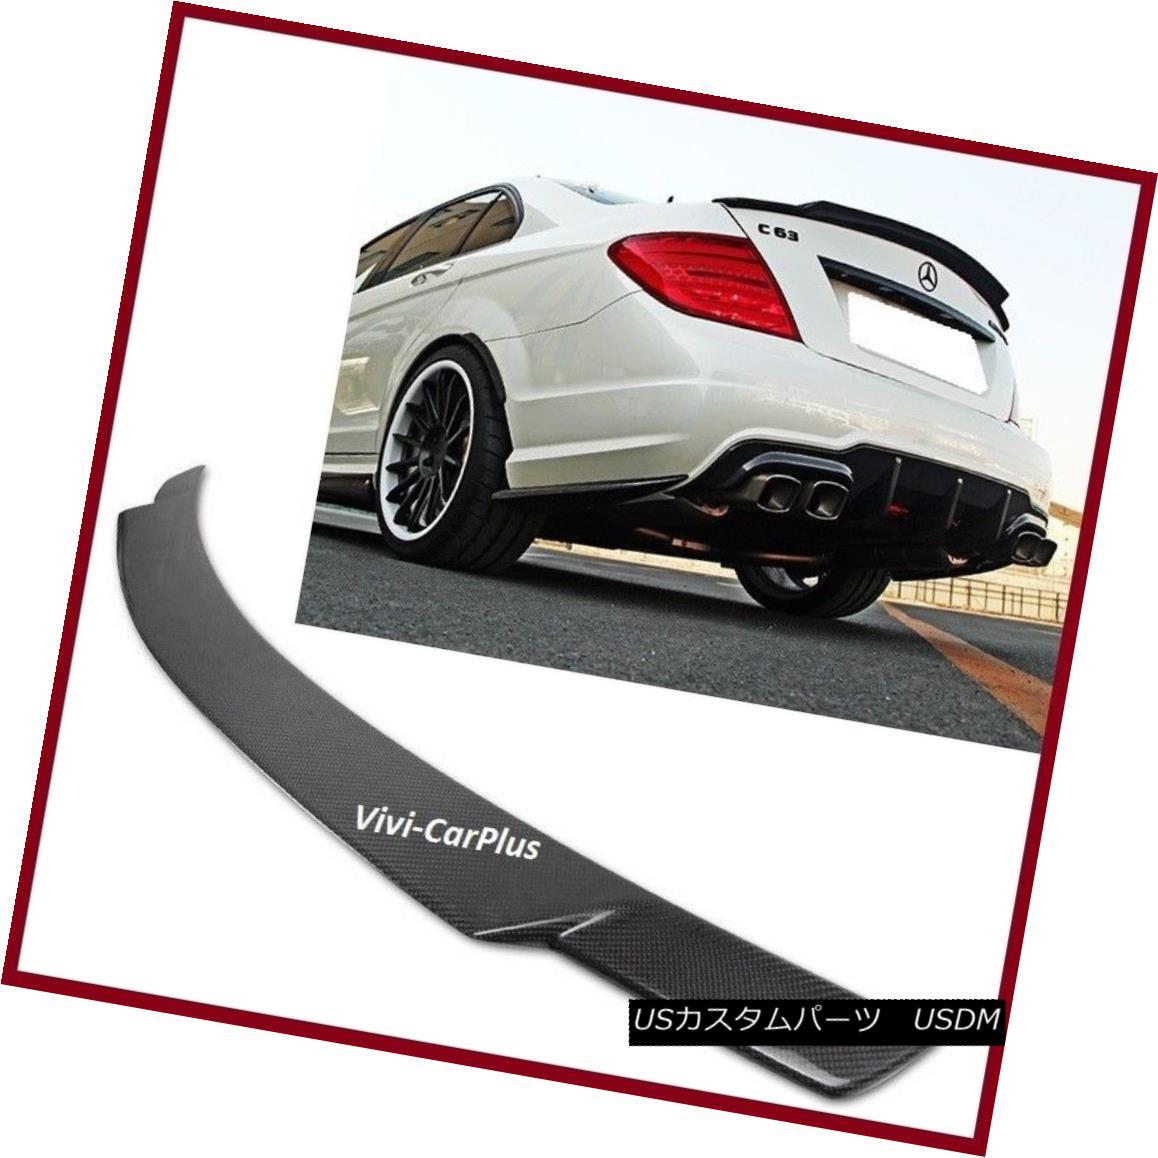 エアロパーツ 08-14 M-Benz W204 C250 C300 C350 C63AMG V Type Trunk Spoiler Carbon Fiber Wing 08-14 MベンツW204 C250 C300 C350 C63AMG Vタイプトランクスポイラーカーボンファイバーウィング